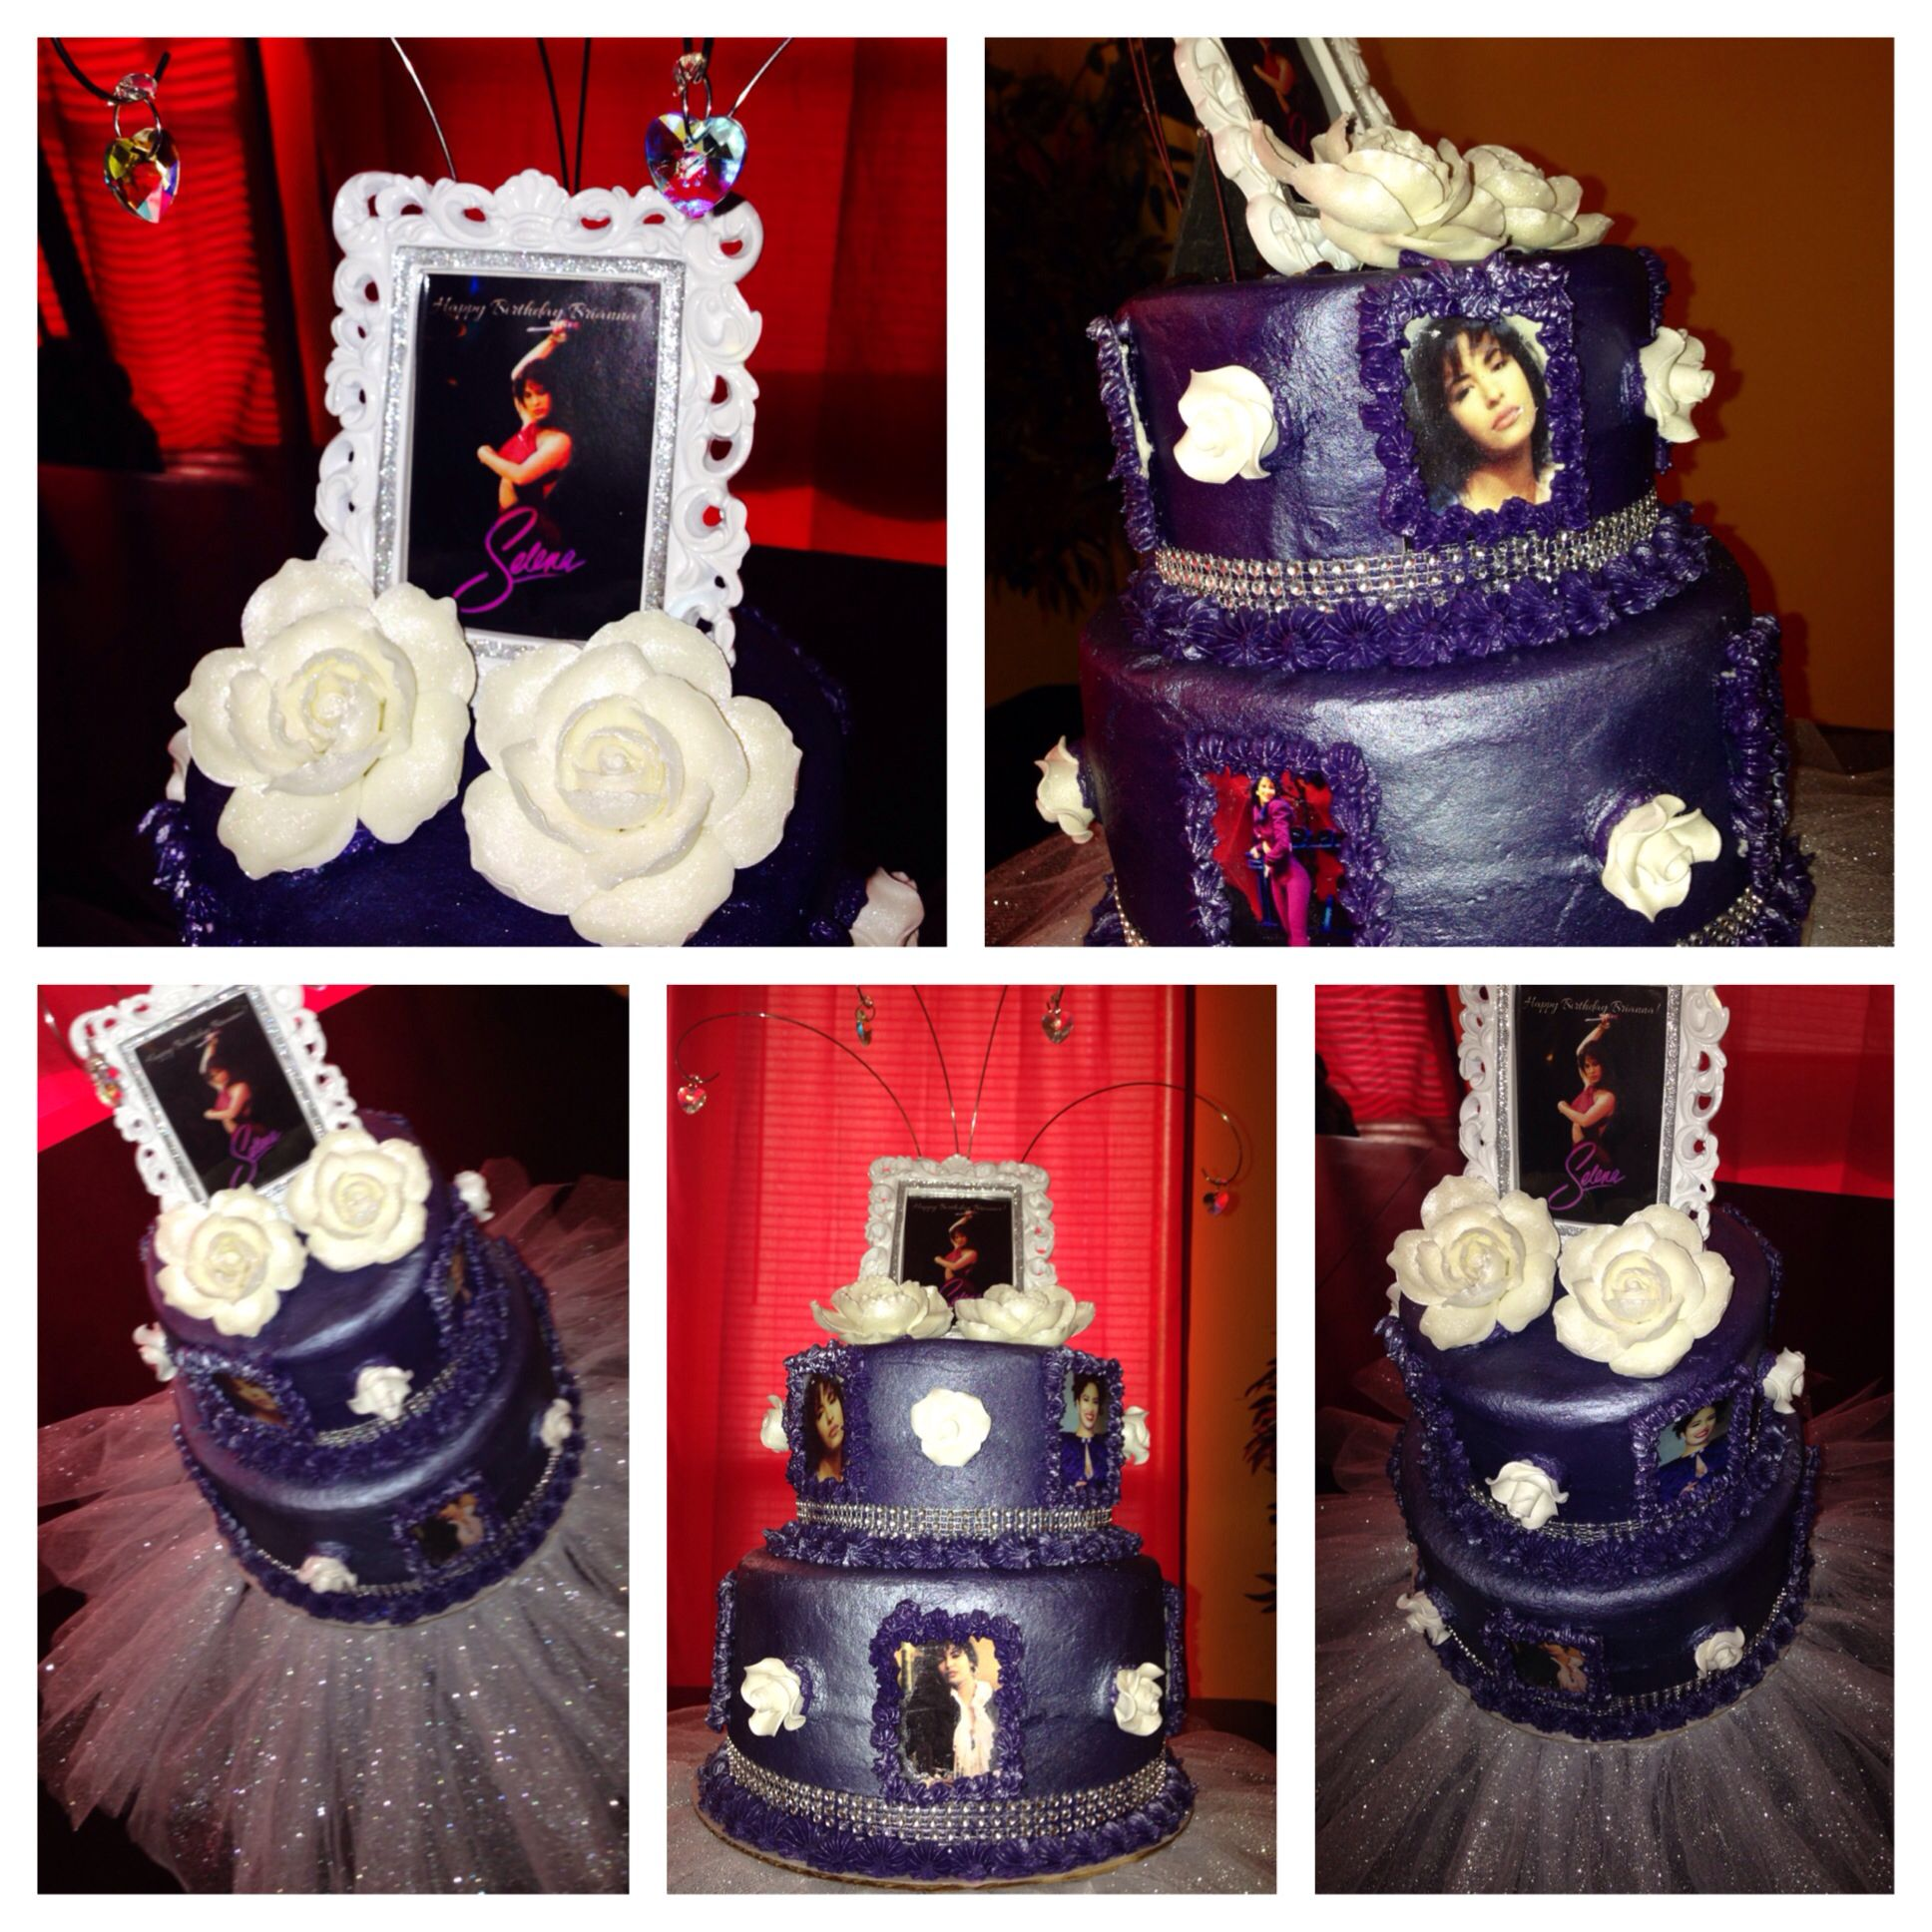 Selena Cake KZteachercakes (With images) Selena